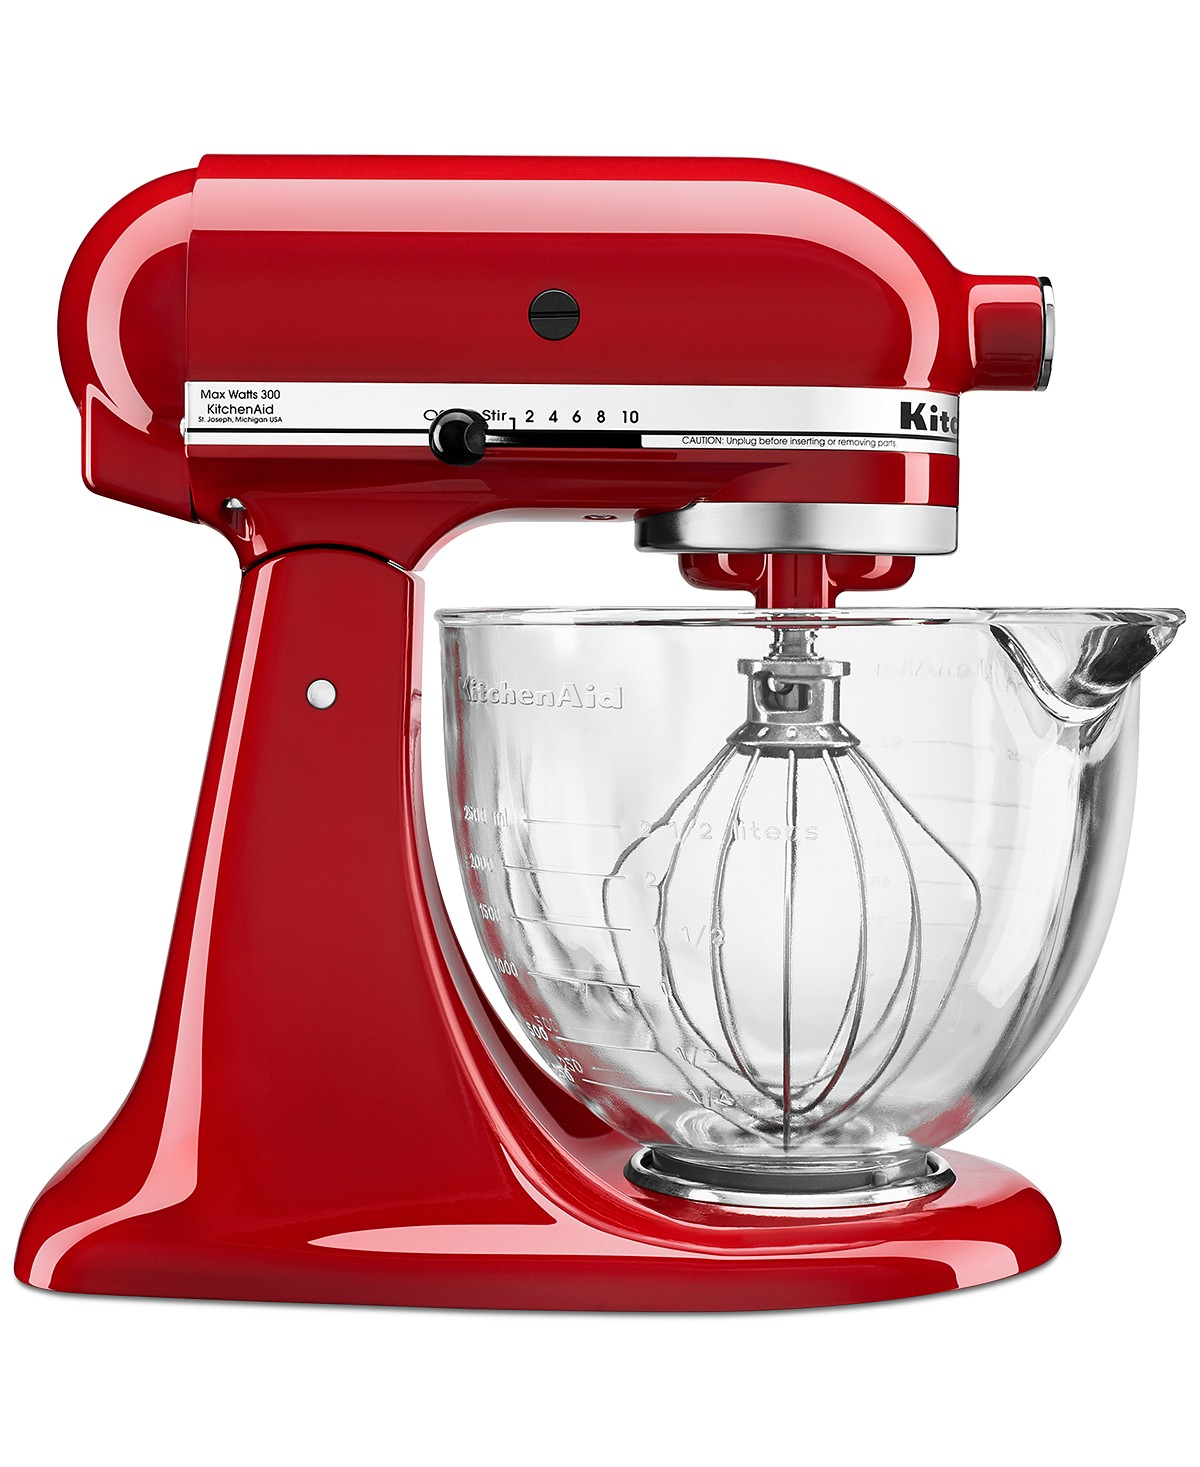 KitchenAid KSM105GBC 5 qt. Stand Mixer with Glass Bowl & Flex Edge Beater